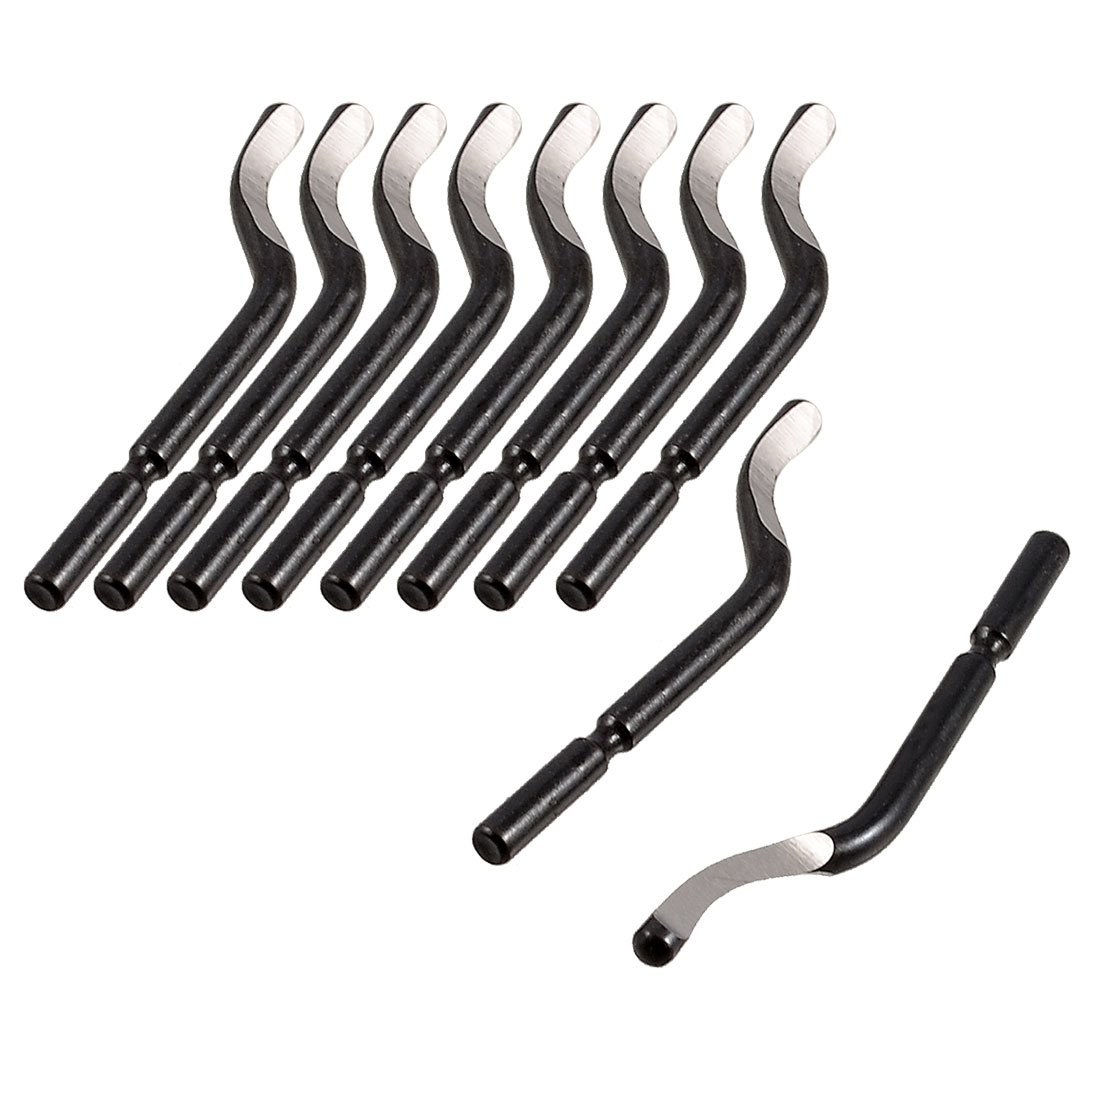 Brand New Repair Part Deburred Tool BS1010 S10 Deburring Blades 10 Pcs